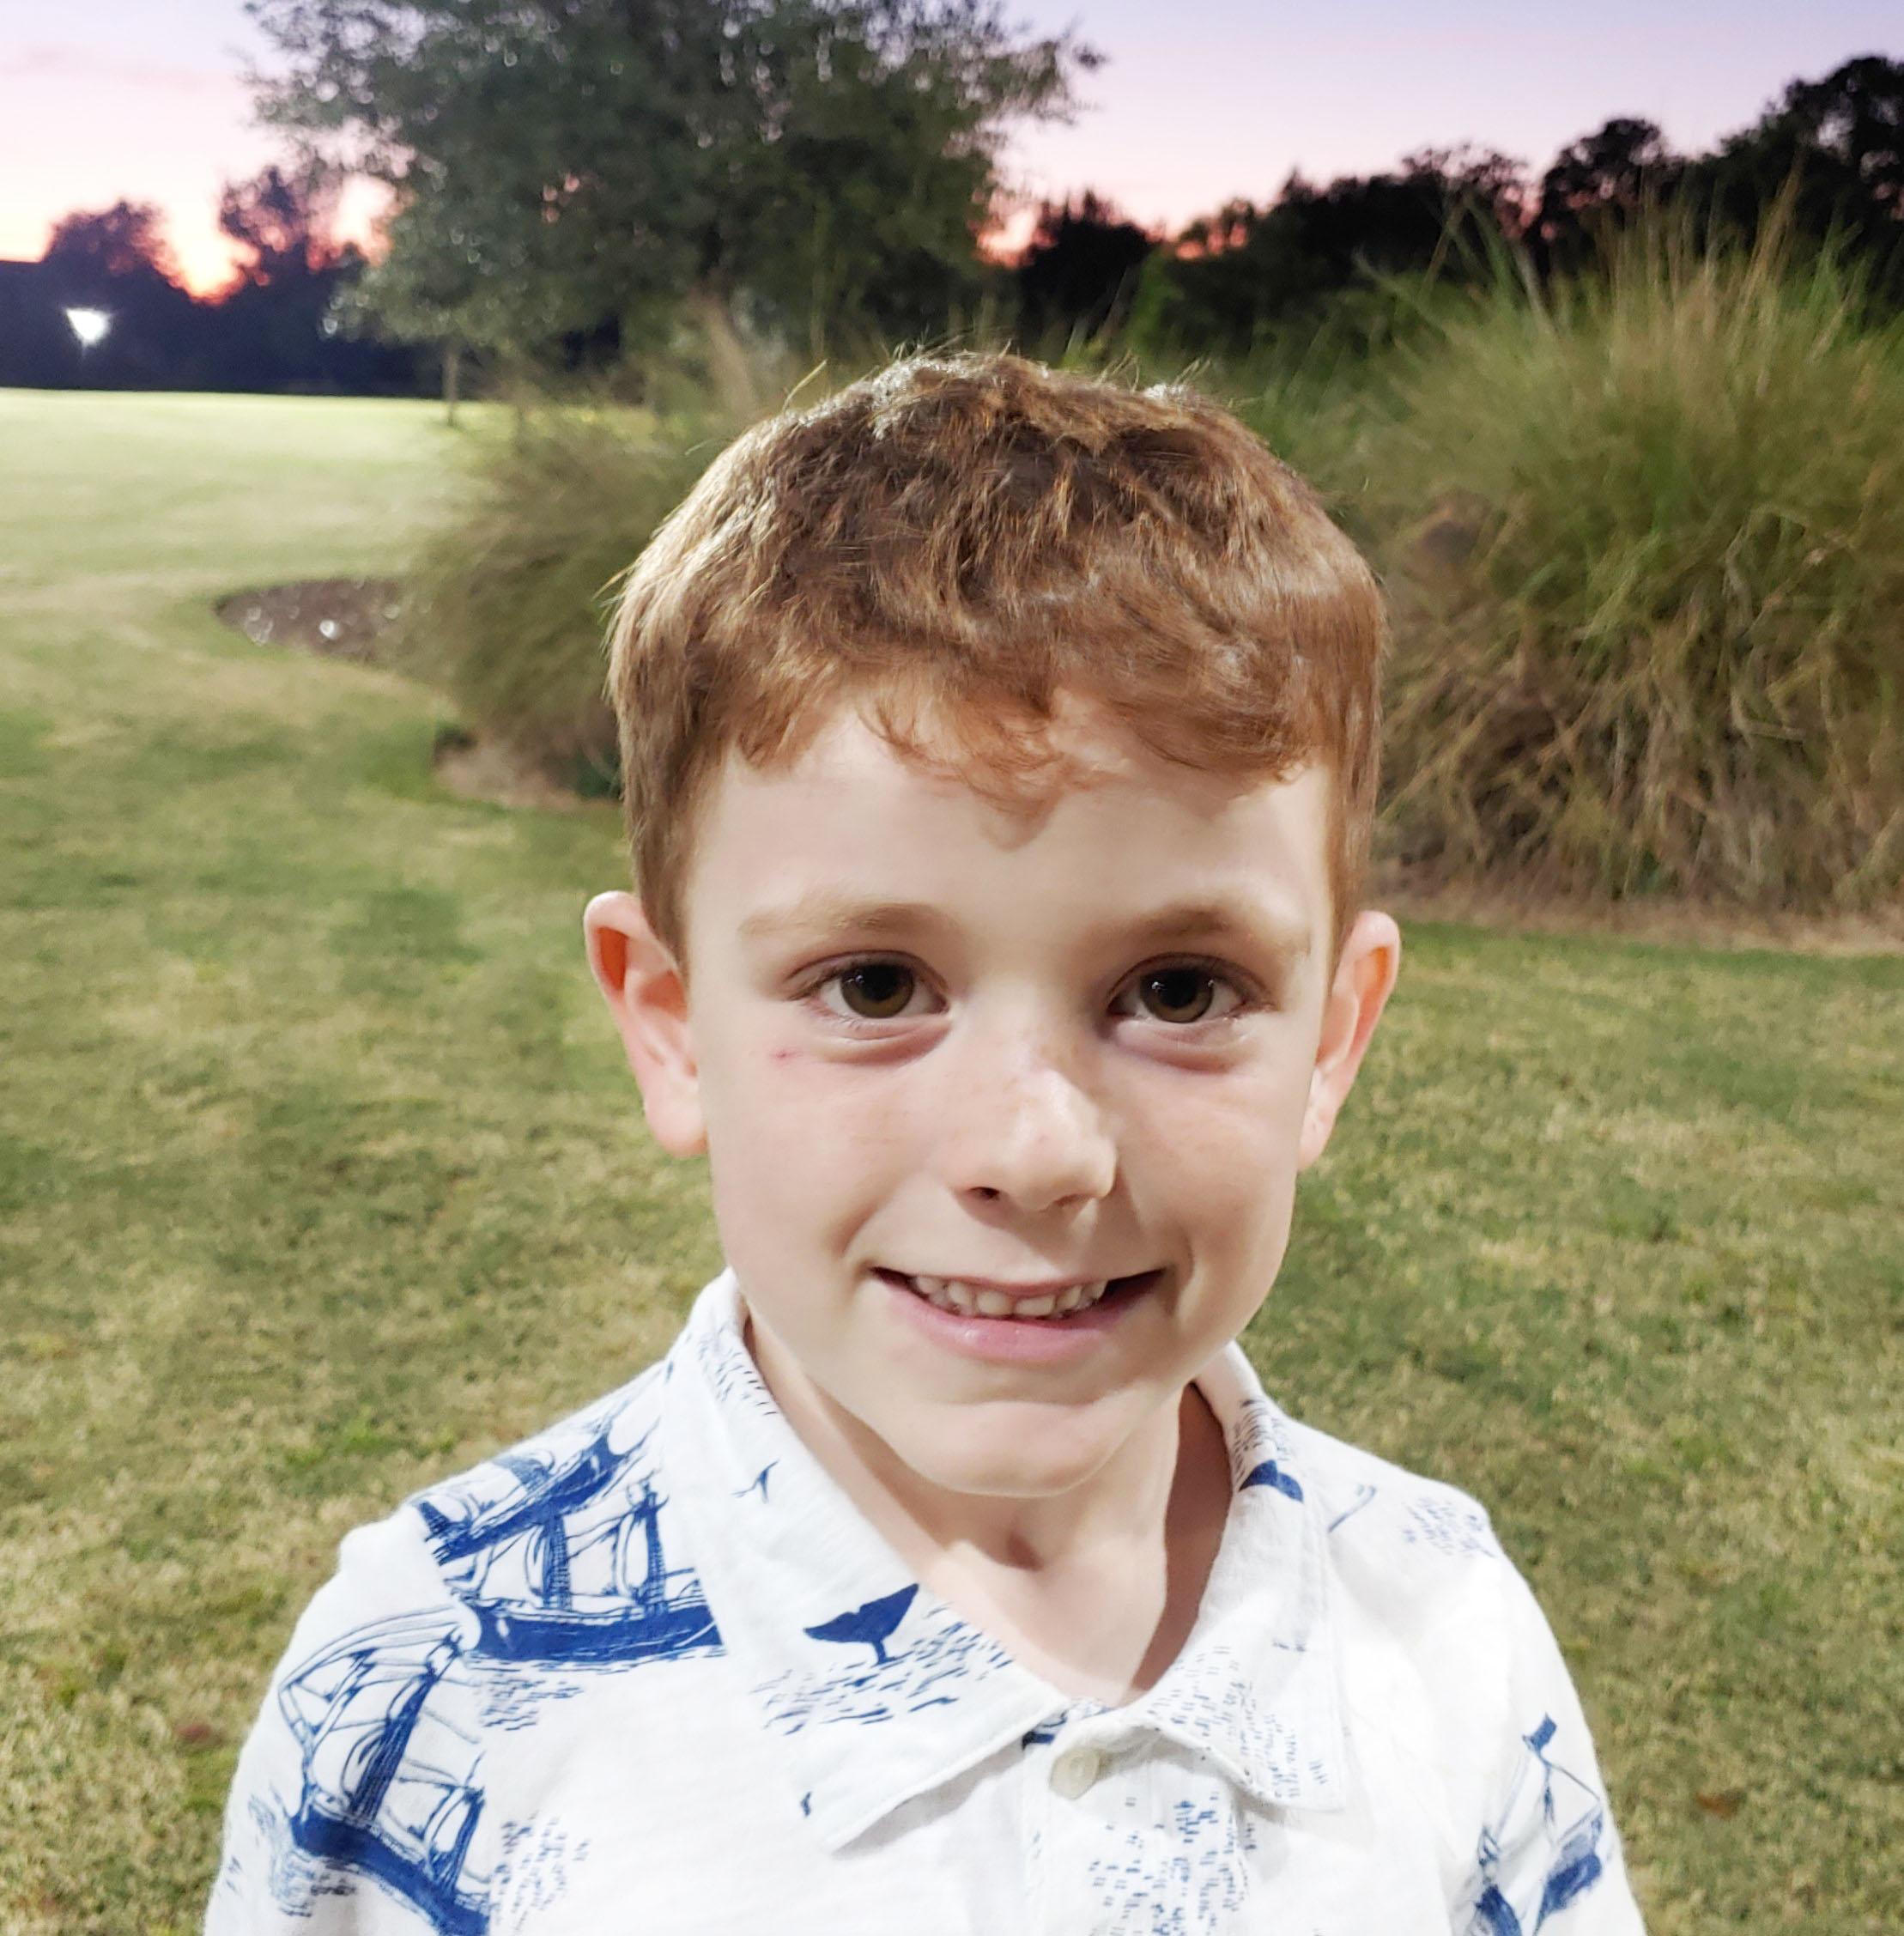 A shark football player because I like the shark head.  Carter, age 6  Daniel Island